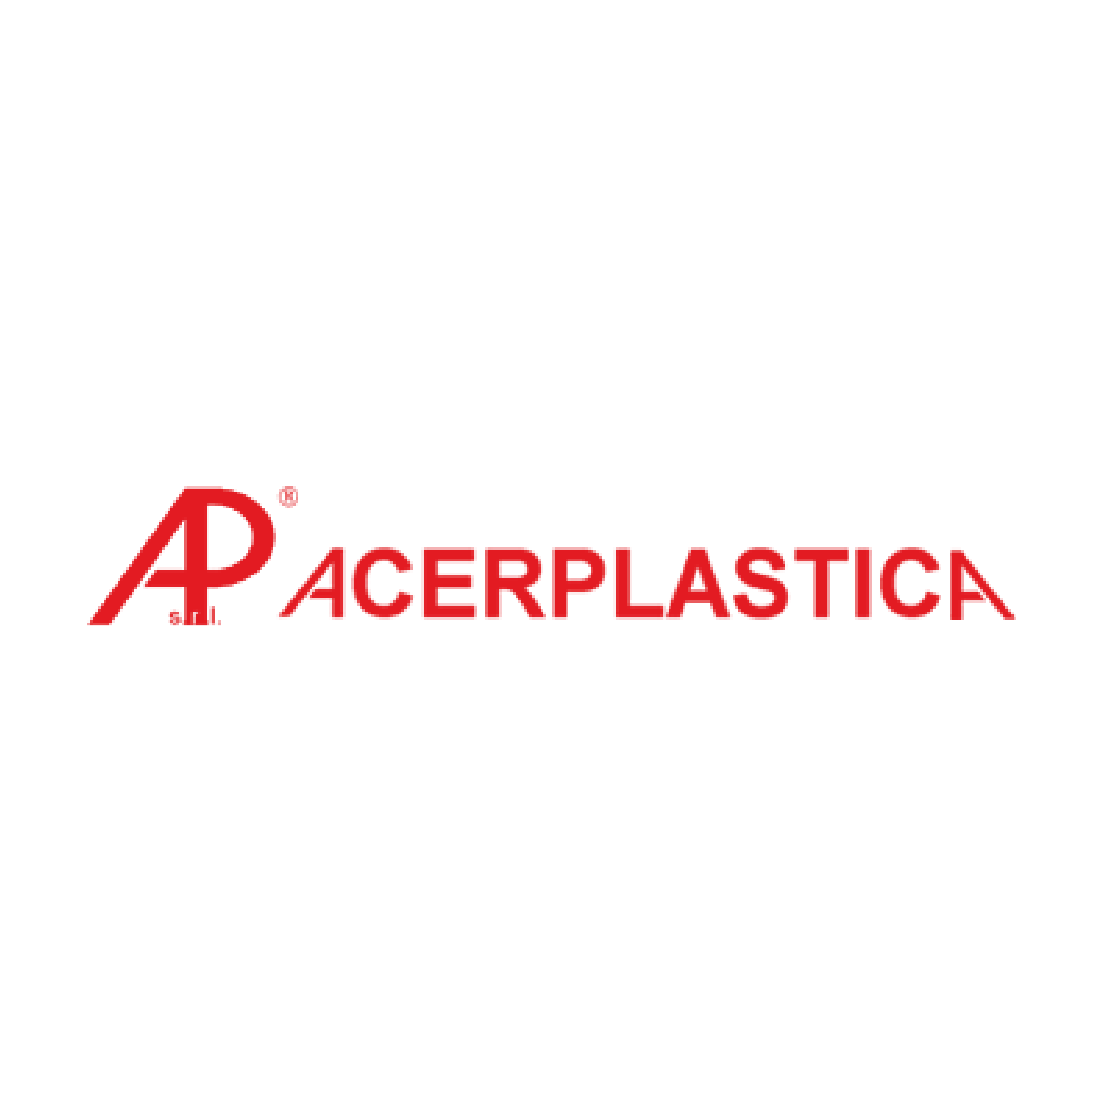 Acer Plastica